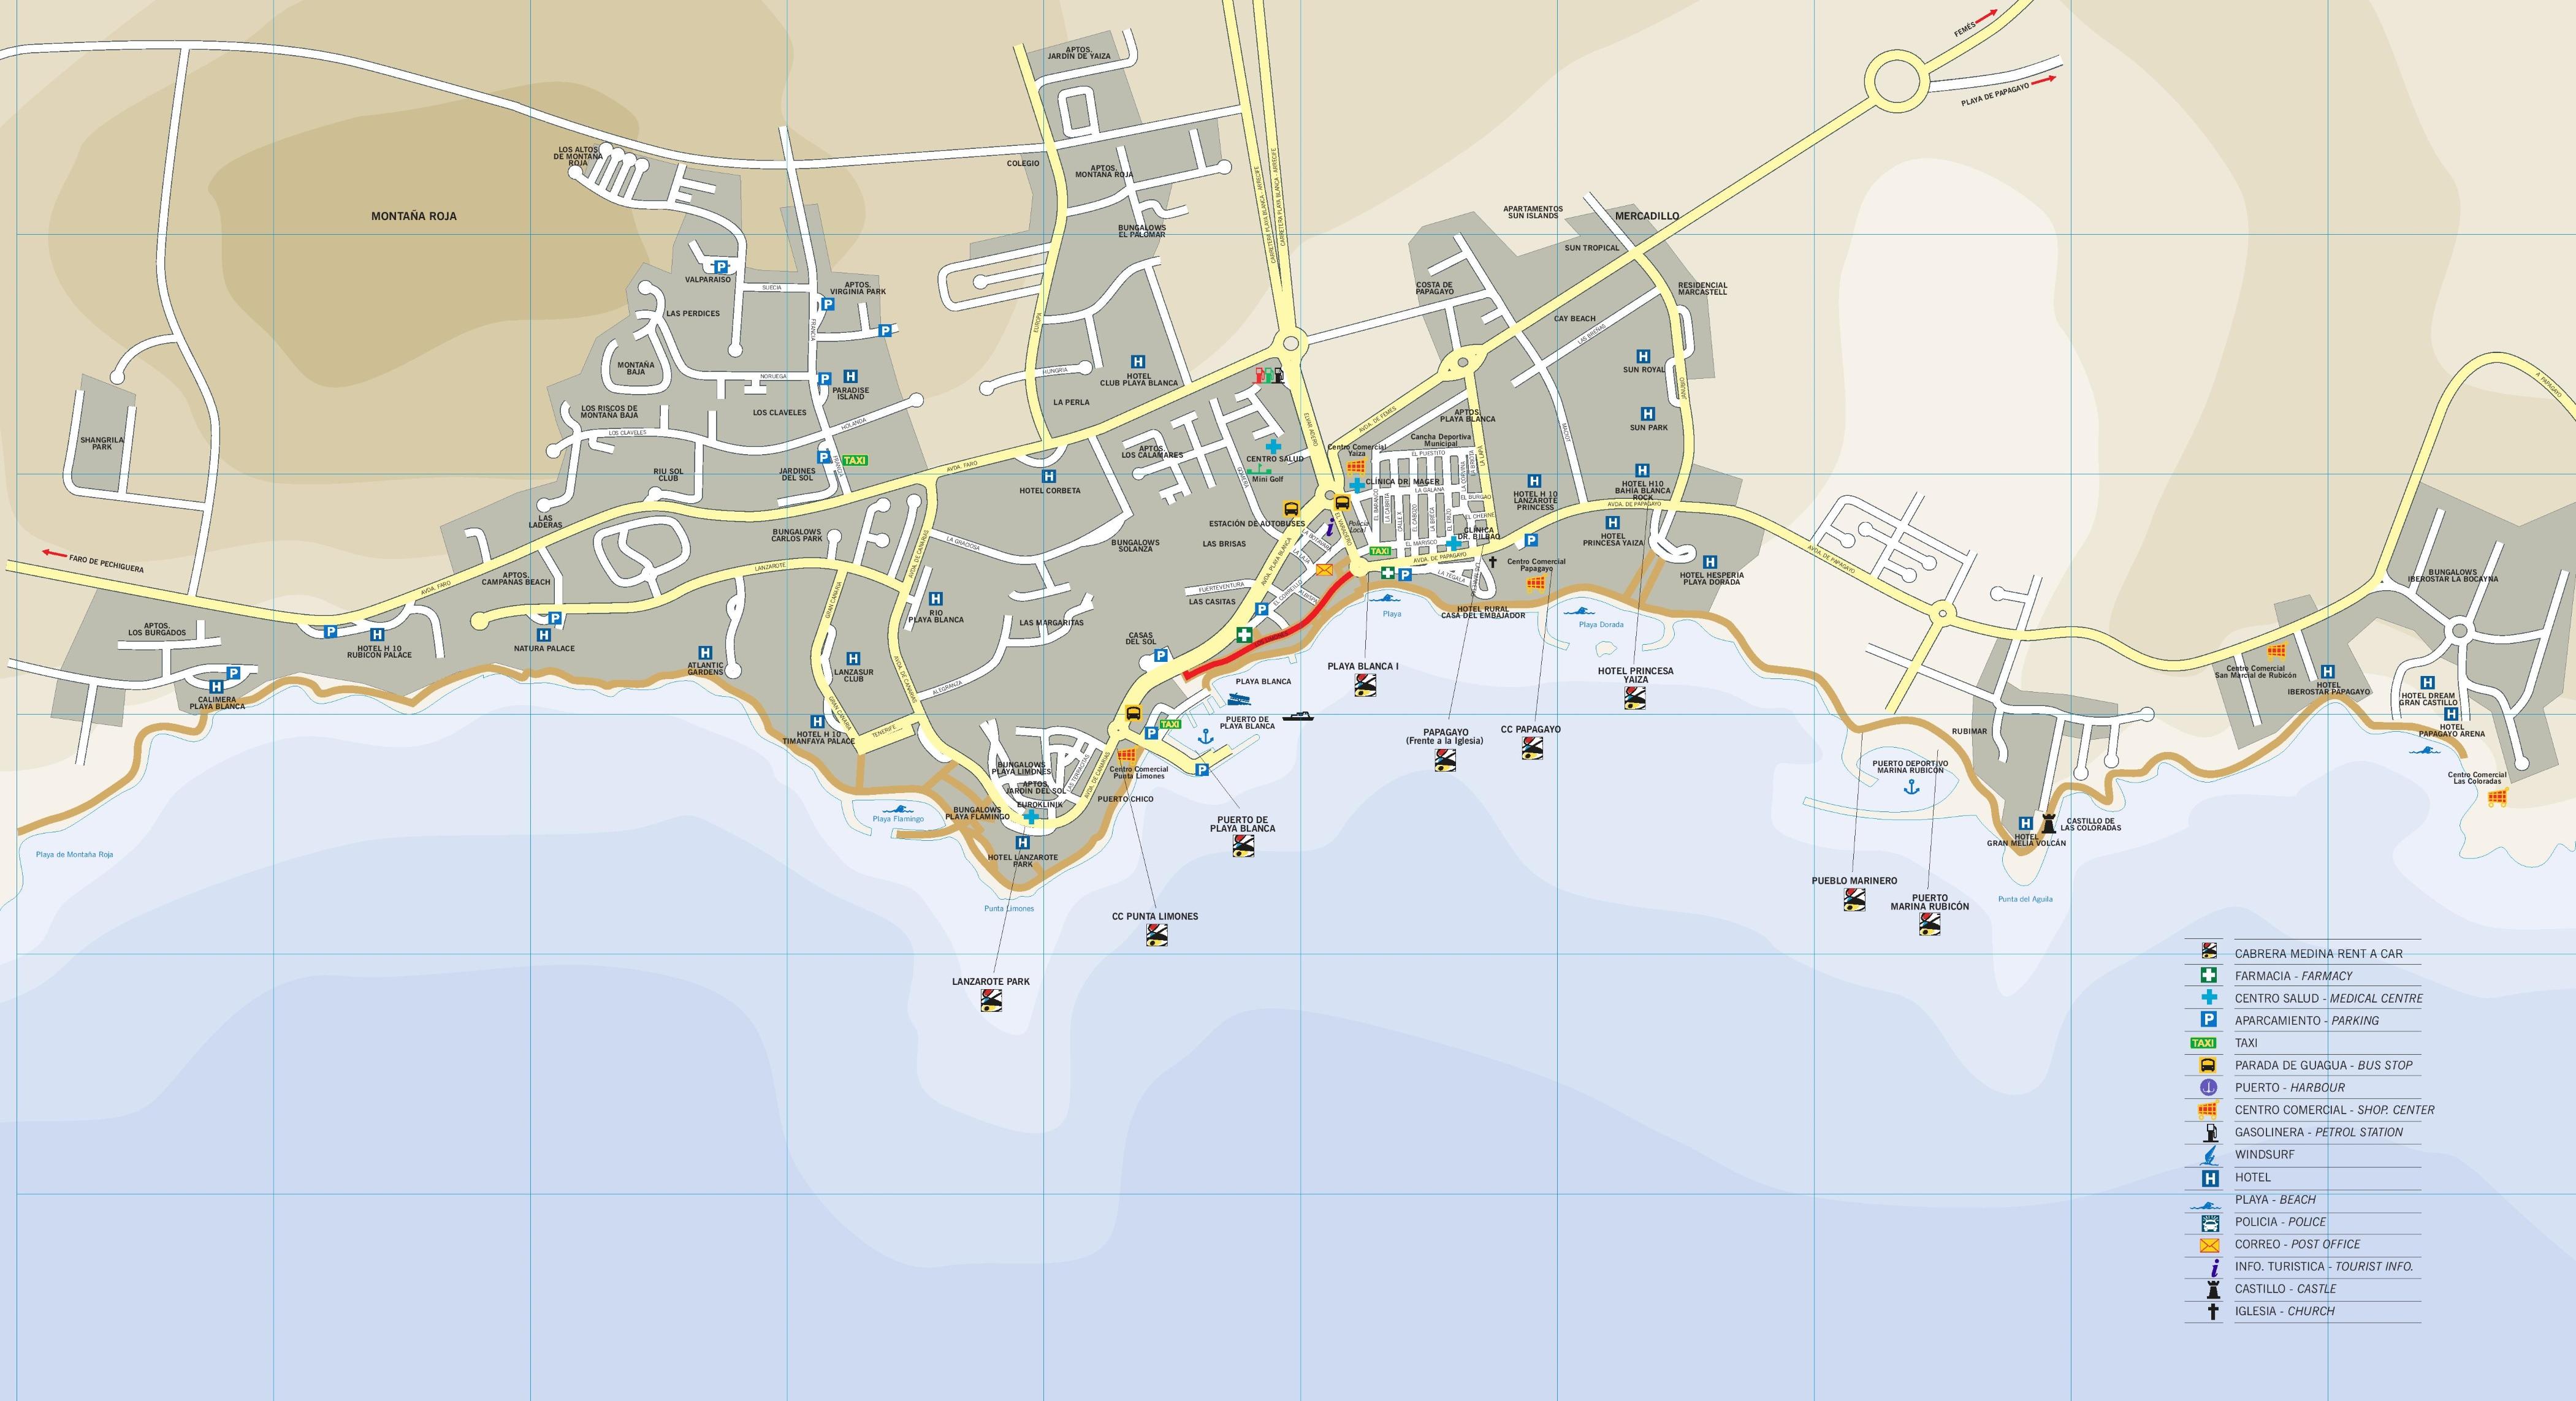 Playa Blanca tourist map